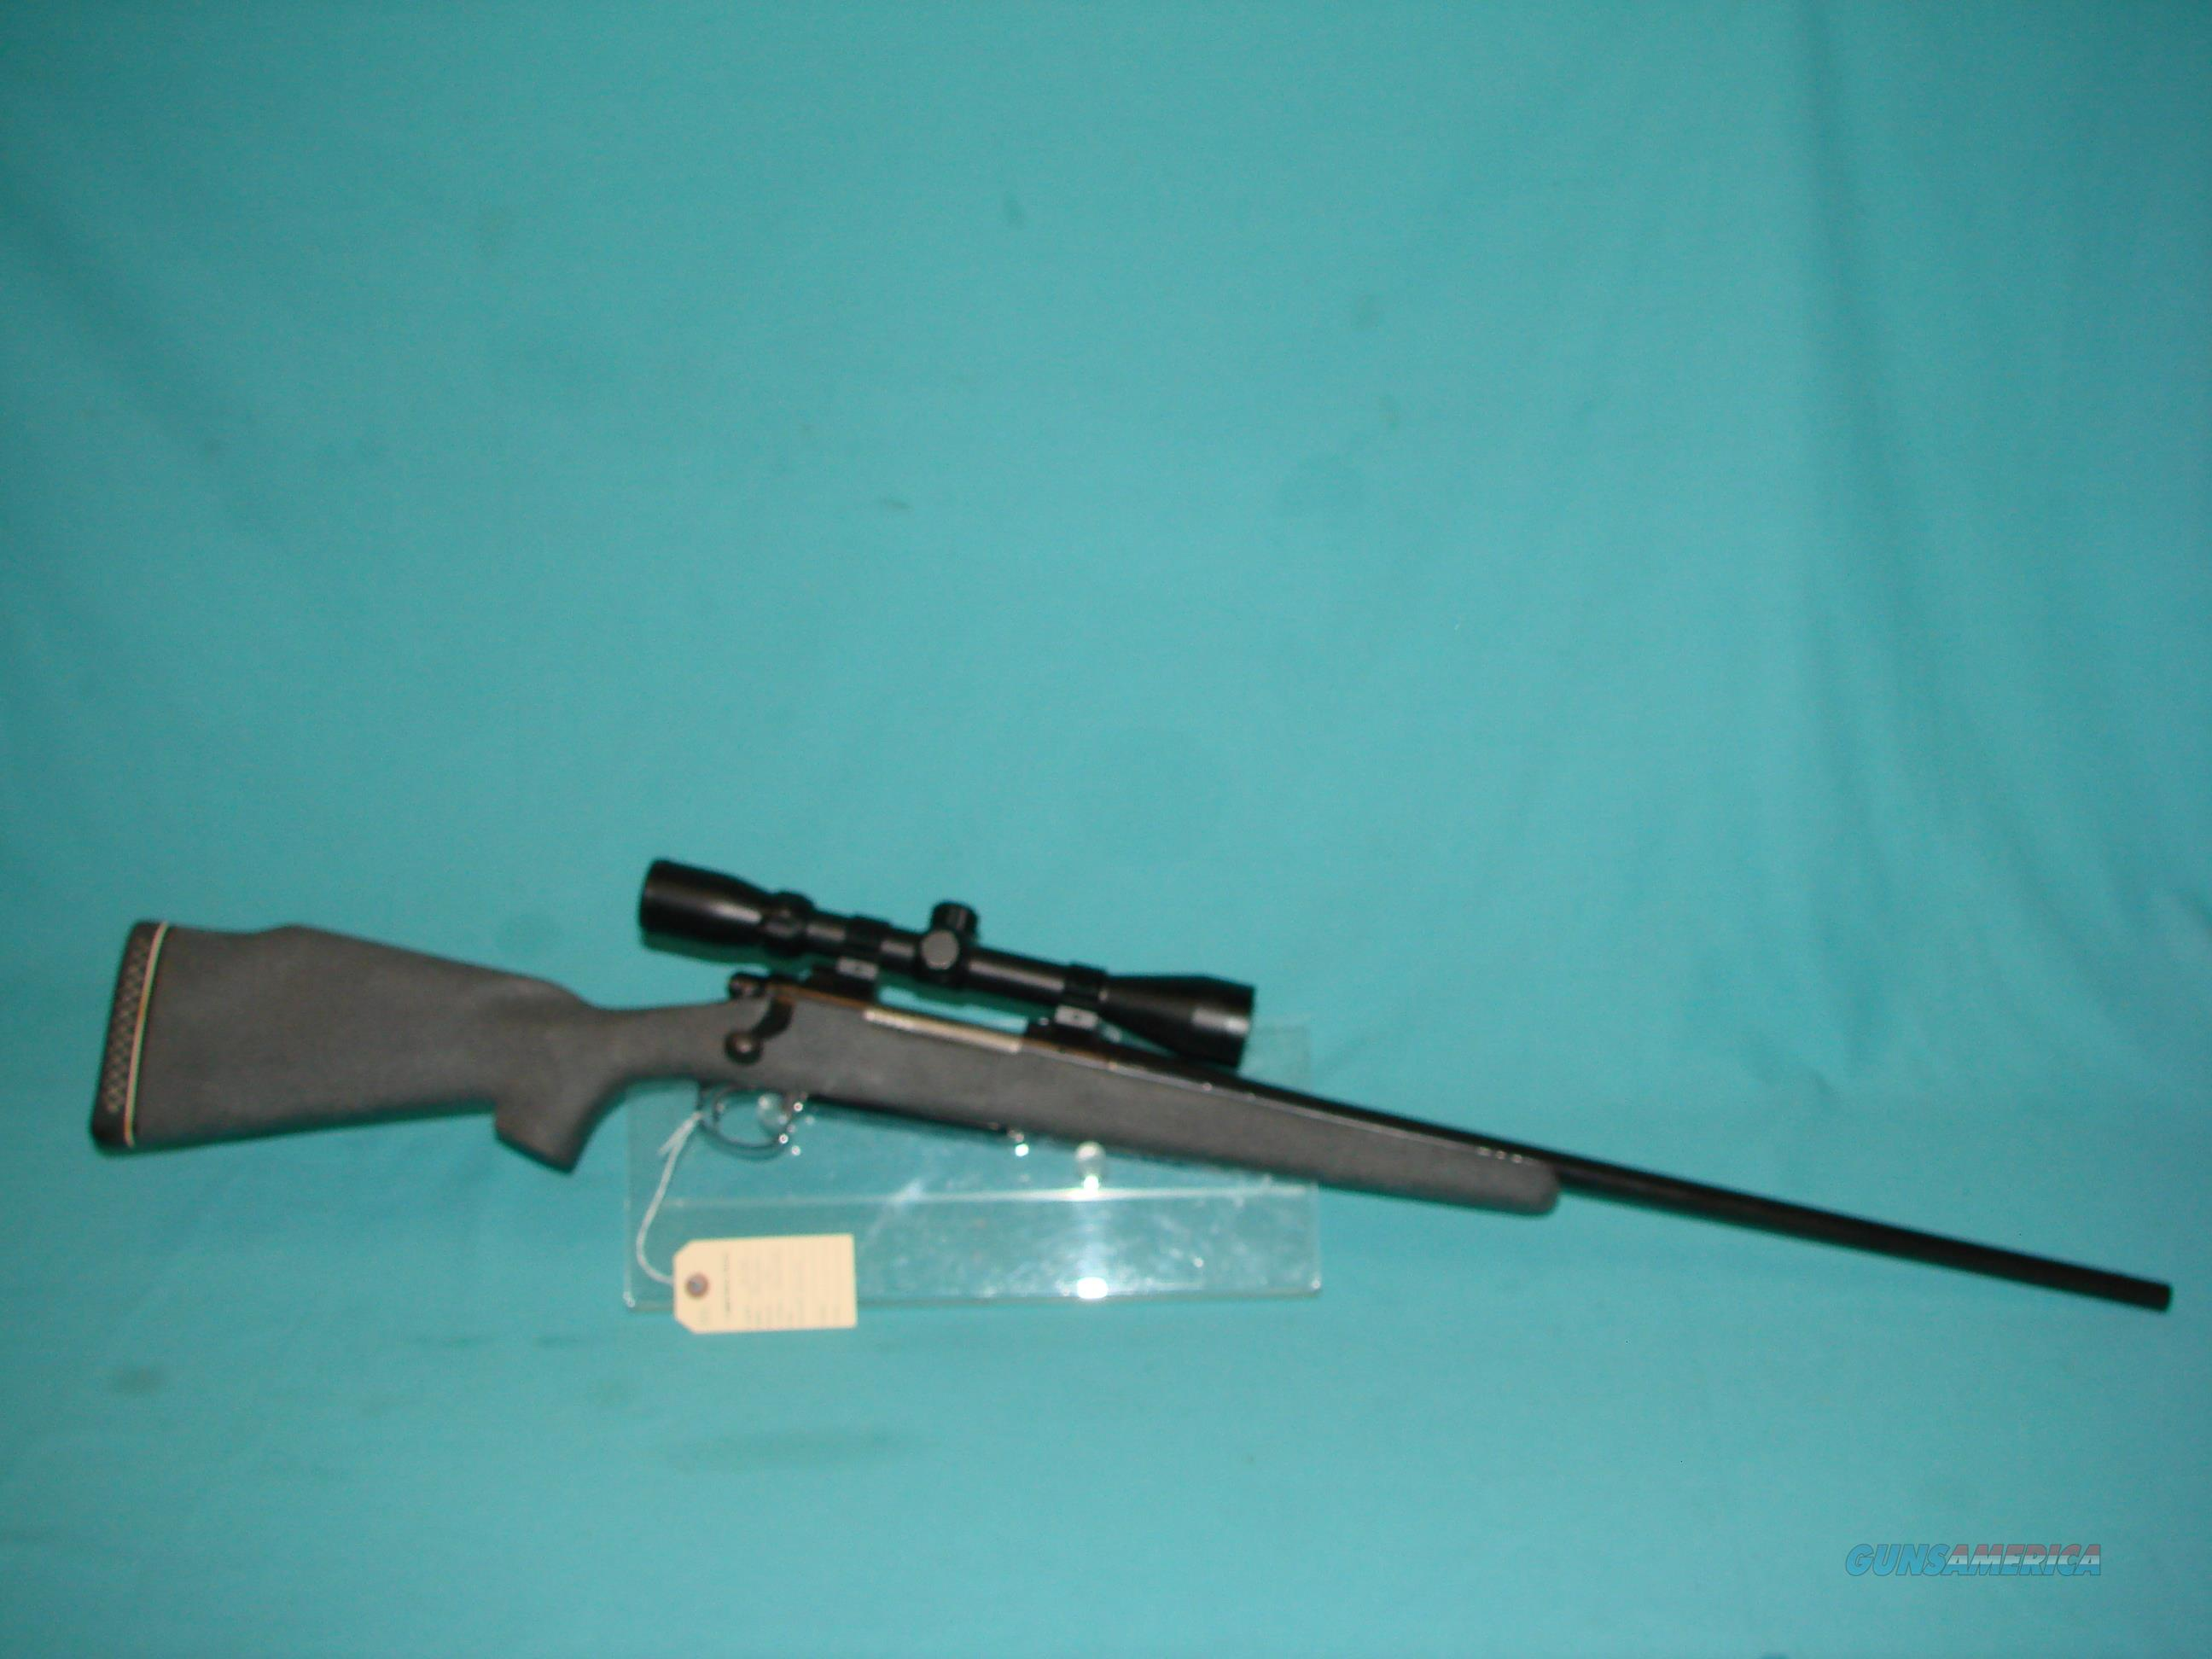 Remington 700  Guns > Rifles > Remington Rifles - Modern > Model 700 > Tactical